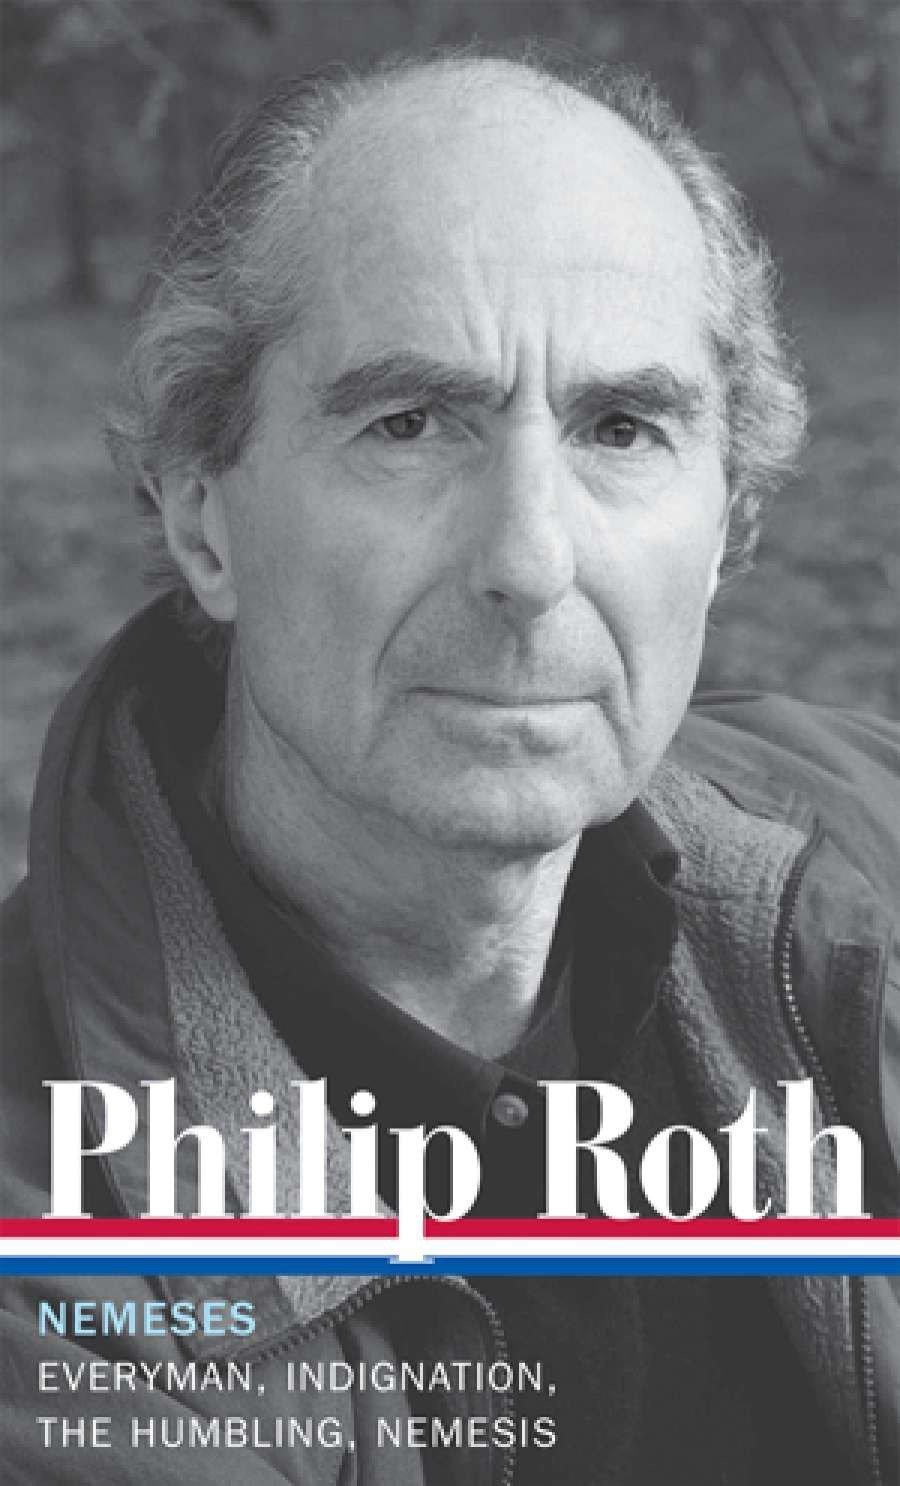 Philip Roth  Nemeses  LOA  237   Everyman   Indignation   The Humbling   Nemesis  Library Of America Philip Roth Edition Band 9